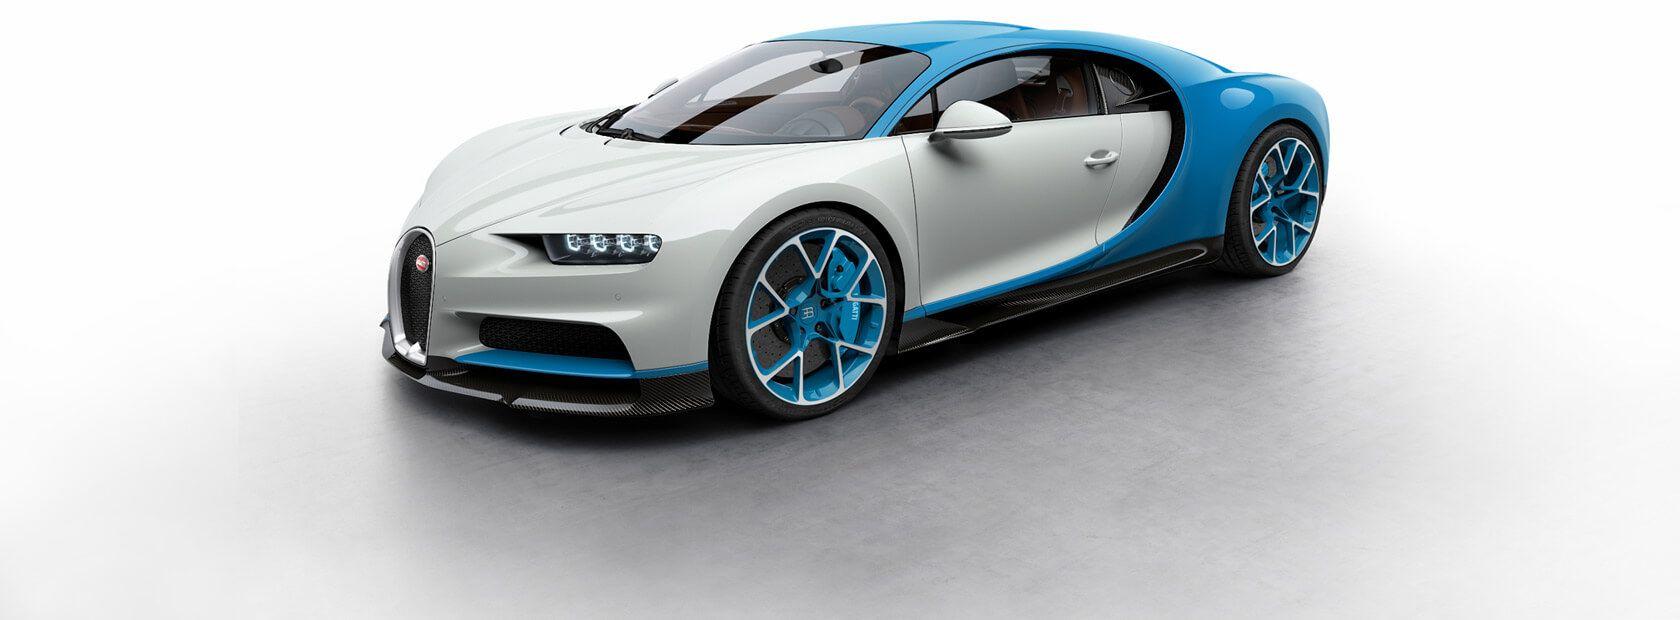 bugatti chiron | bugatti chiron 2016, expensive cars and cars